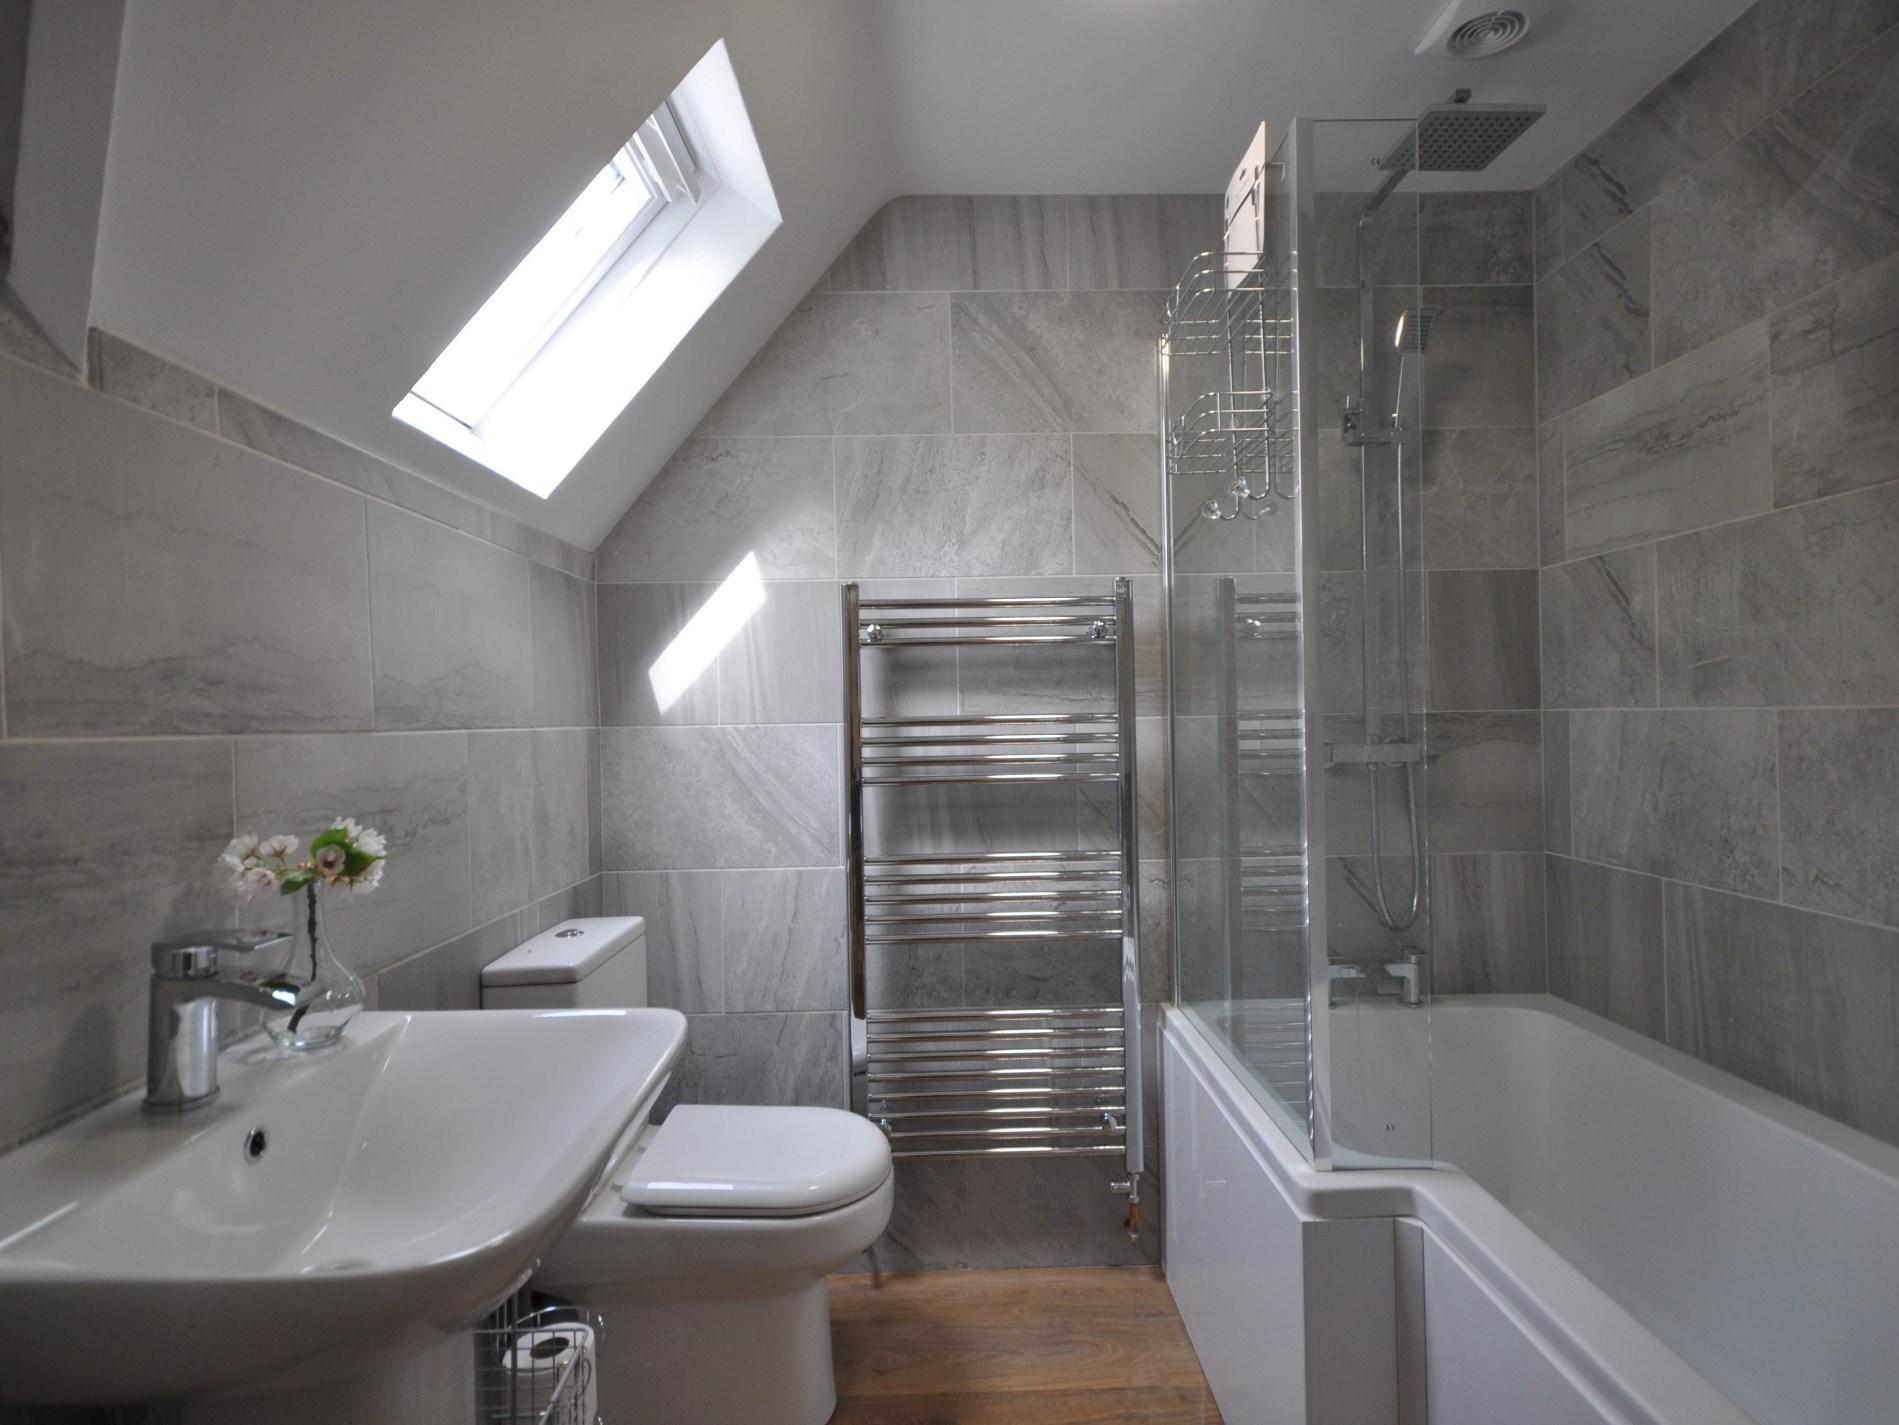 Enjoy soaking in the en-suite bathroom